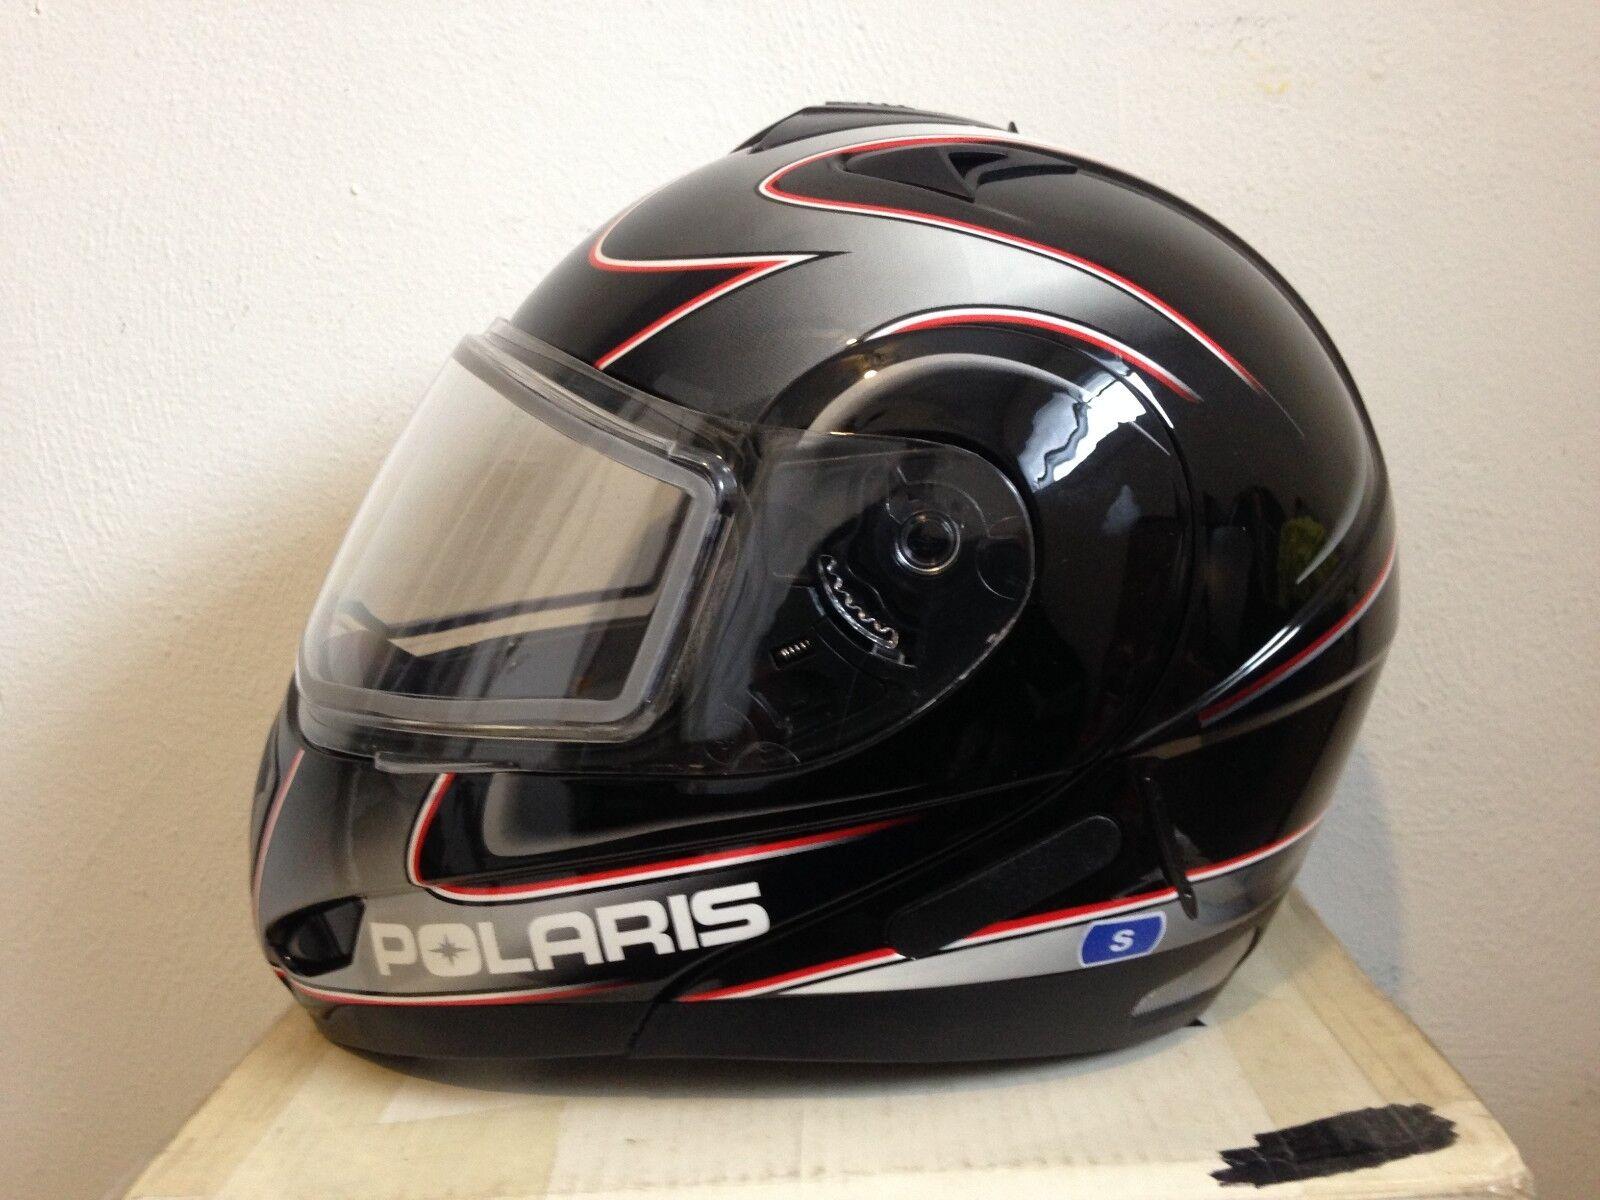 75% off polaris  MODULAR snowmobile helmet xc sp rush fusion  discount promotions